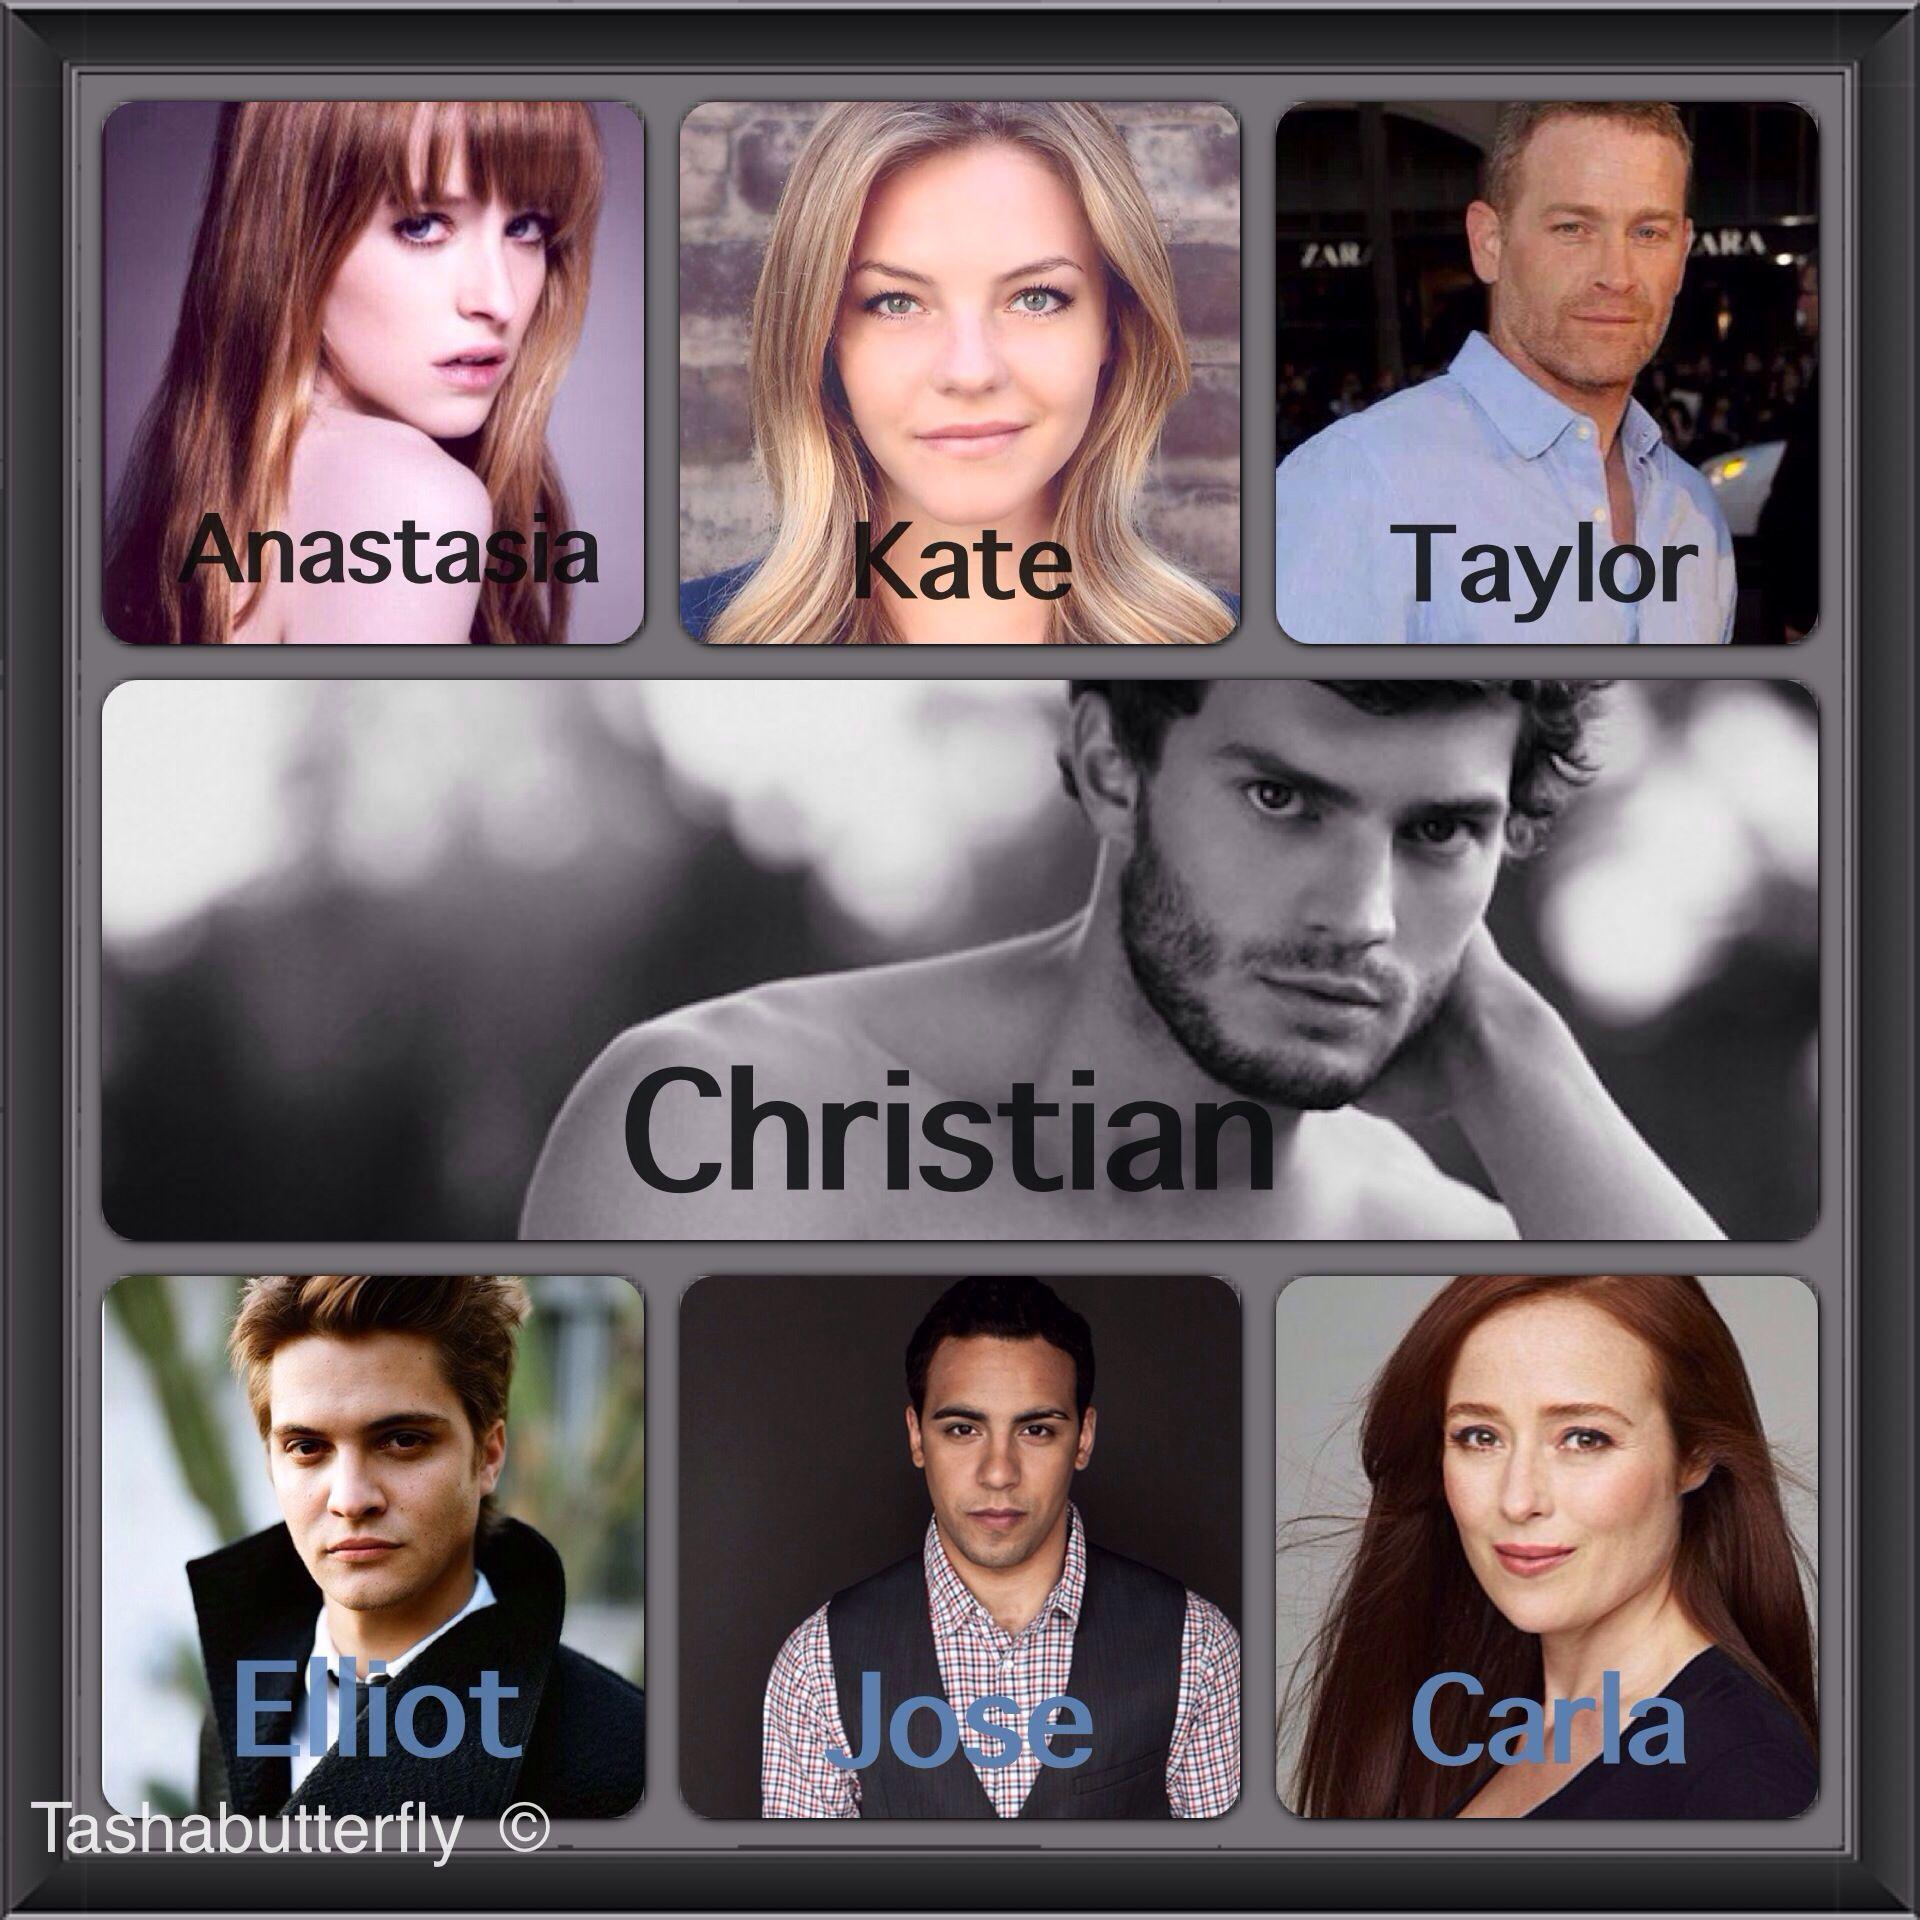 Fifty Shades Of Grey Cast So Far Fiftyshadesofgrey Christiangrey Steele Kate Jose Taylor Carla Elliot